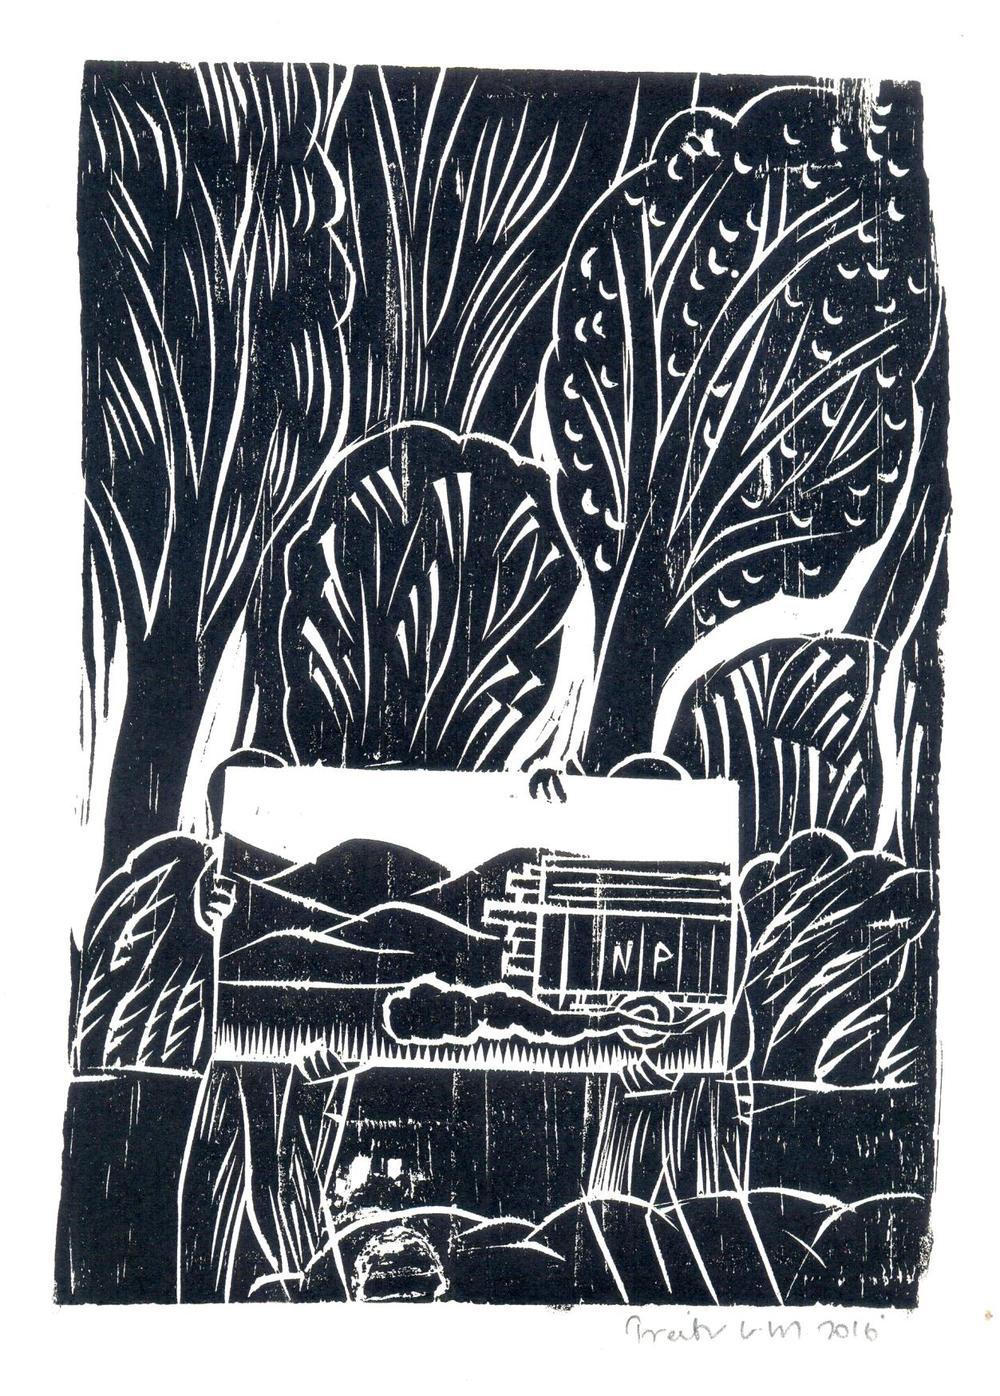 "Treibor Mawlong | NP (National Permit) | Woodcut print | 9.5"" x 7"" | 2016"